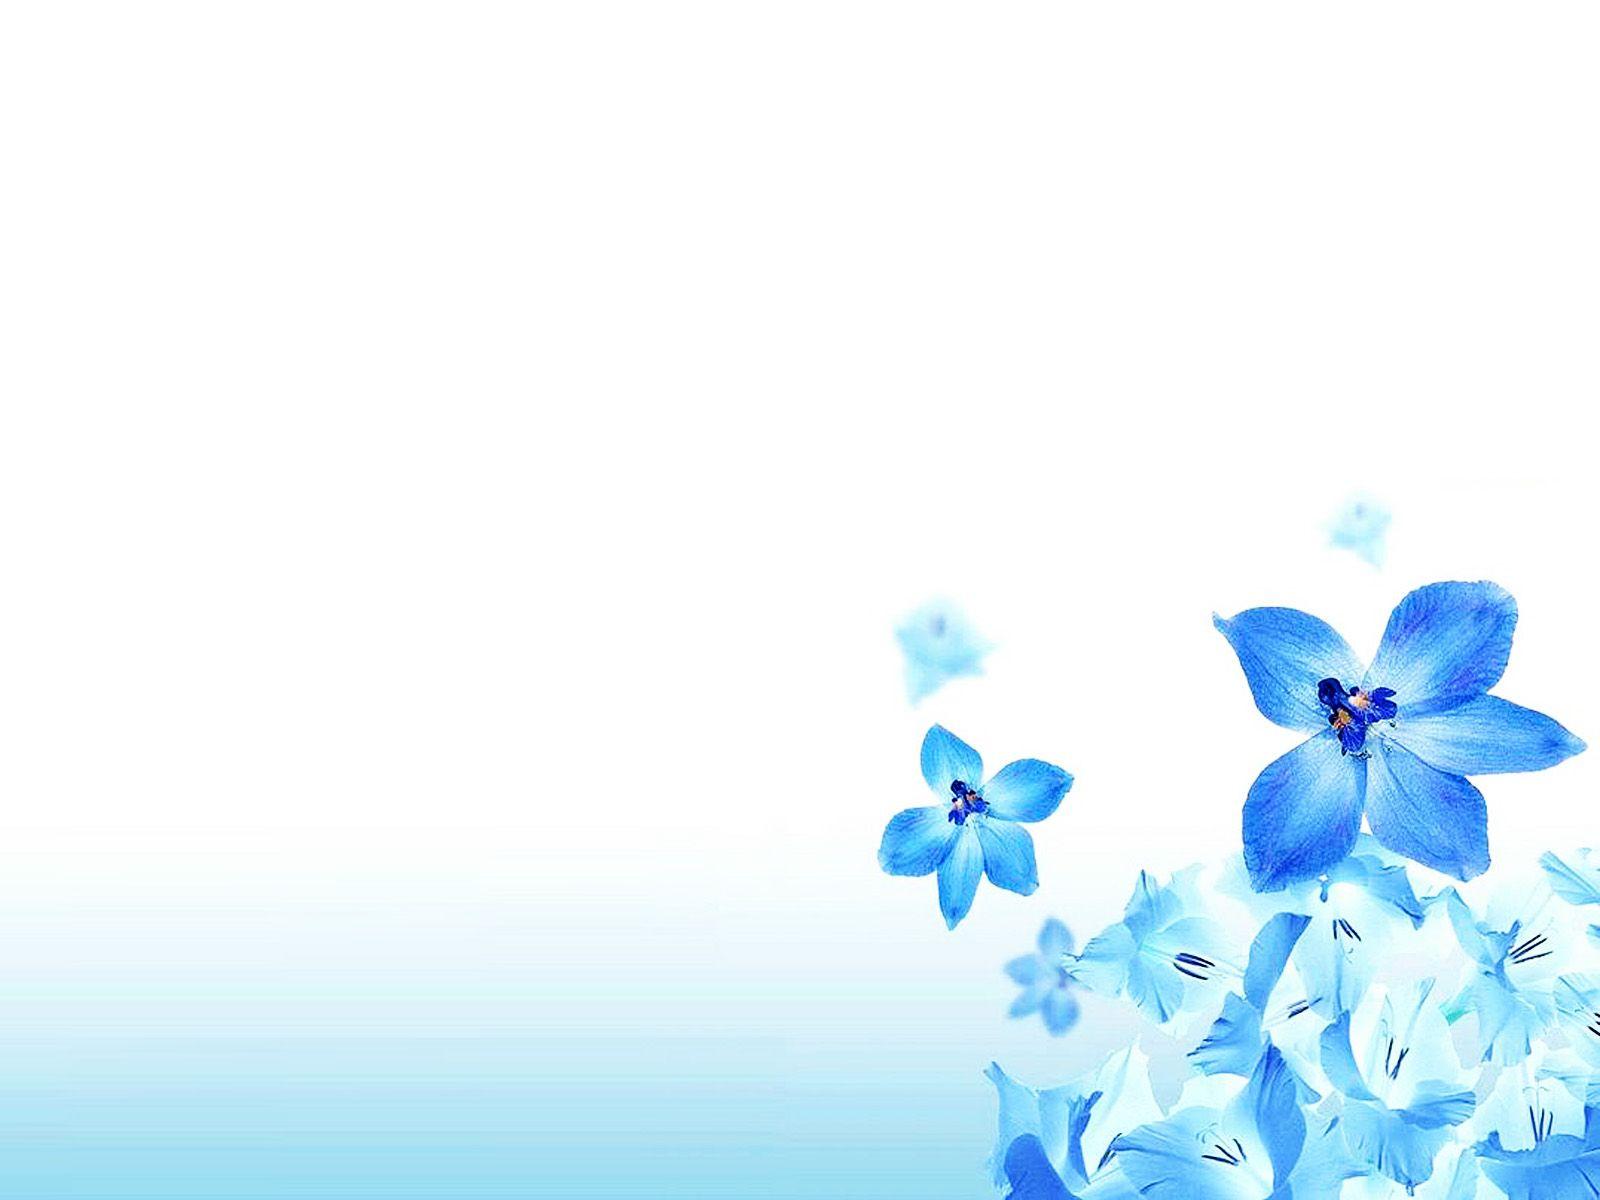 Christian Flowers Backgrounds Jpg 1600 1200 Flower Backgrounds Bubbles Wallpaper Floral Border Design